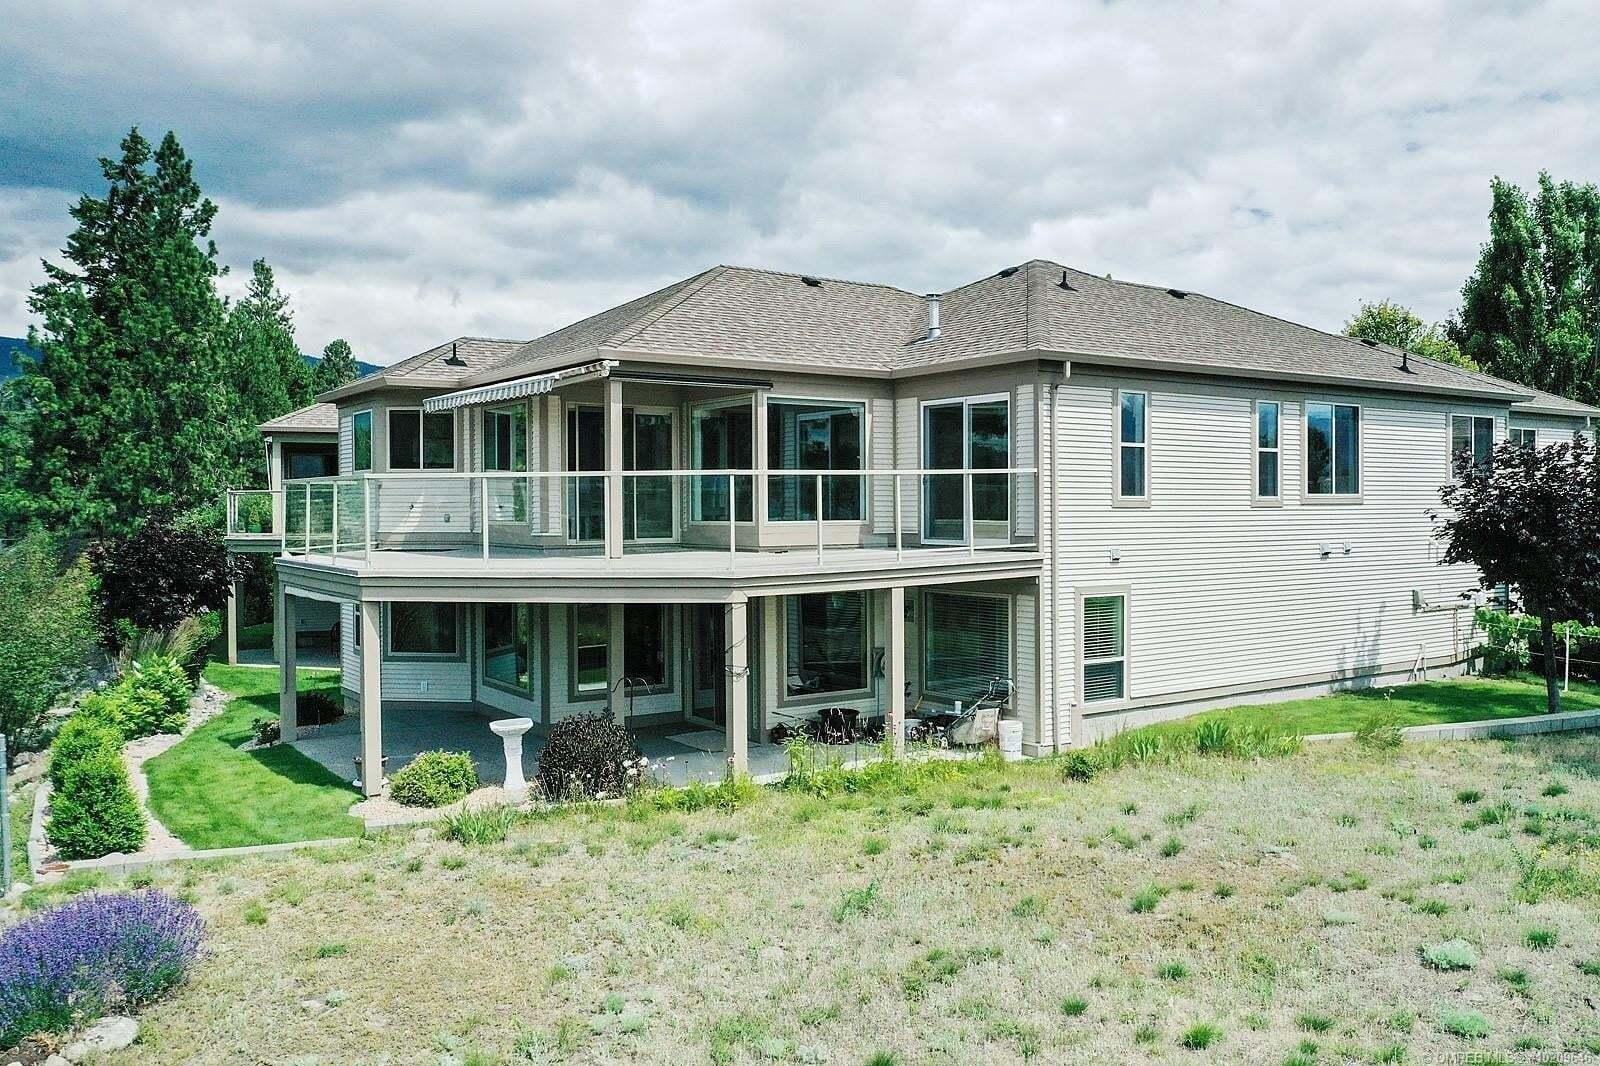 House for sale at 4074 Gellatly Rd Unit 117 West Kelowna British Columbia - MLS: 10209646